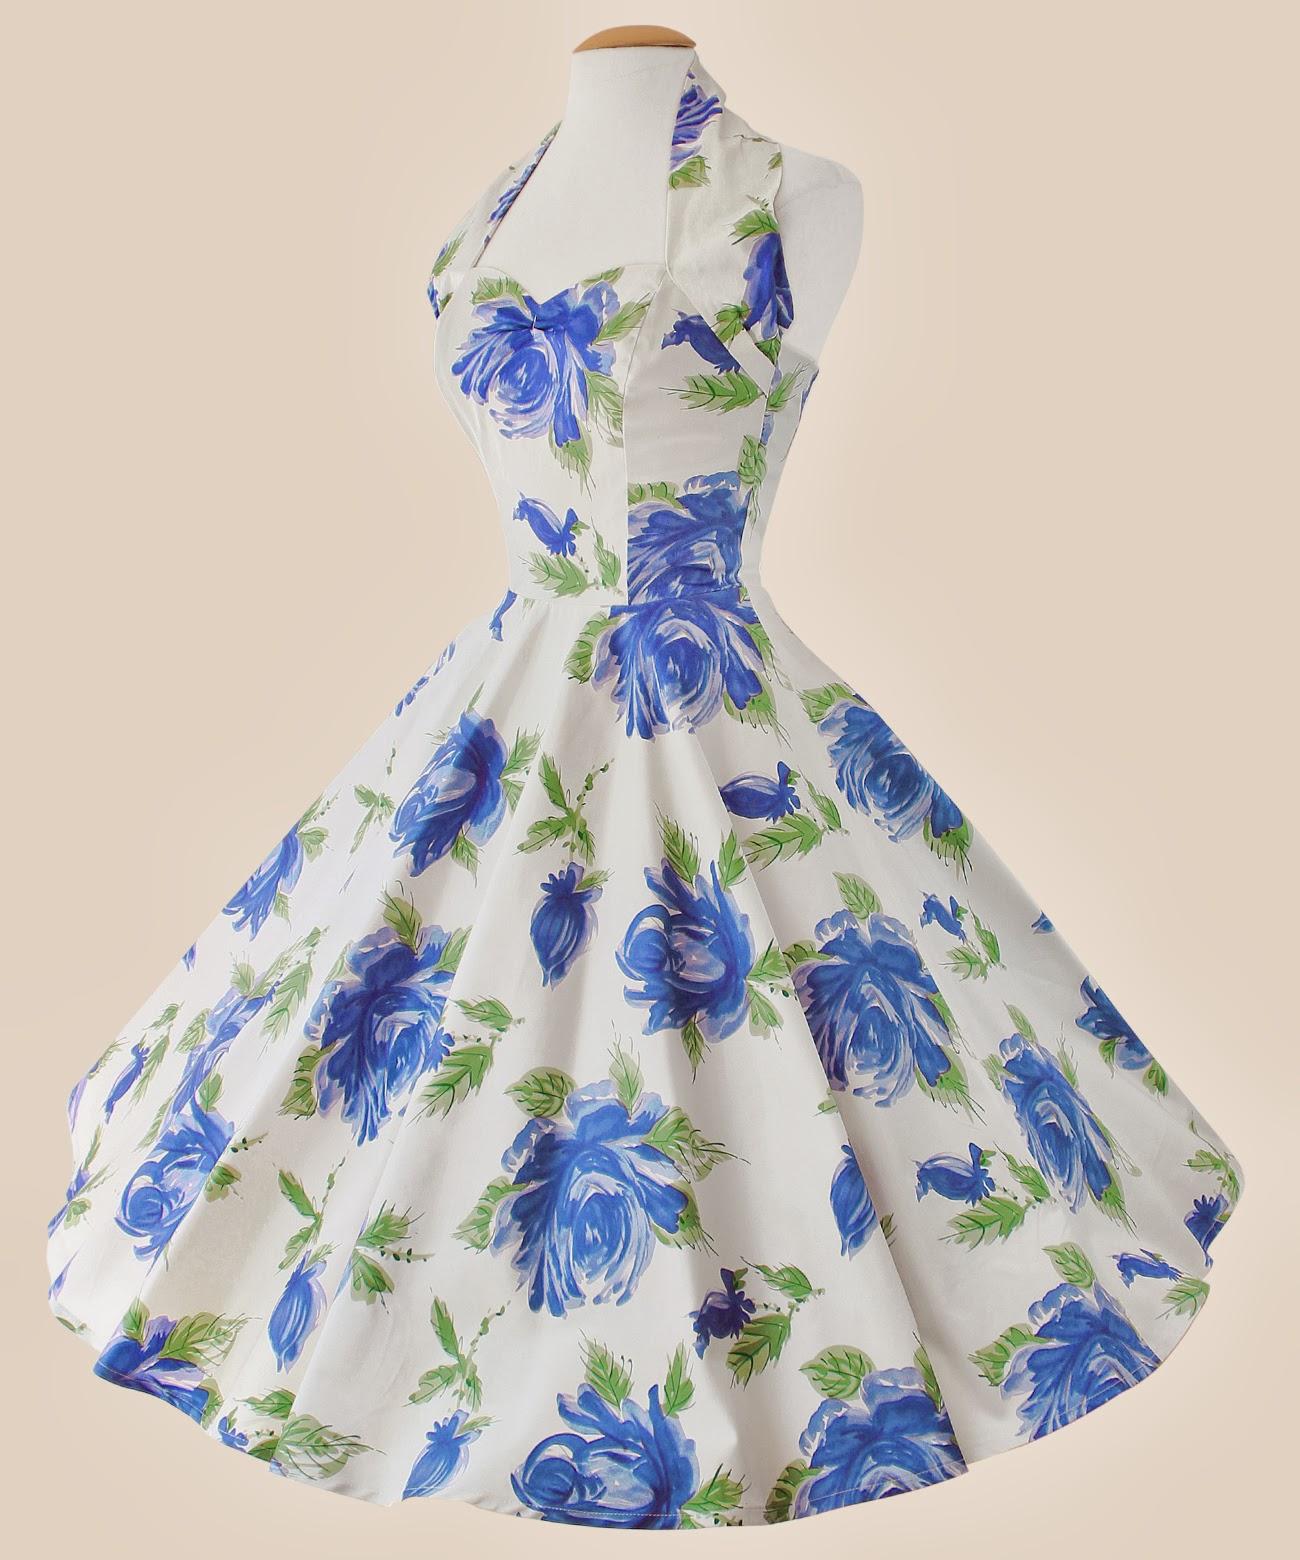 50's Halter Neck Floral Dress - £89 - Vivien of Holloway